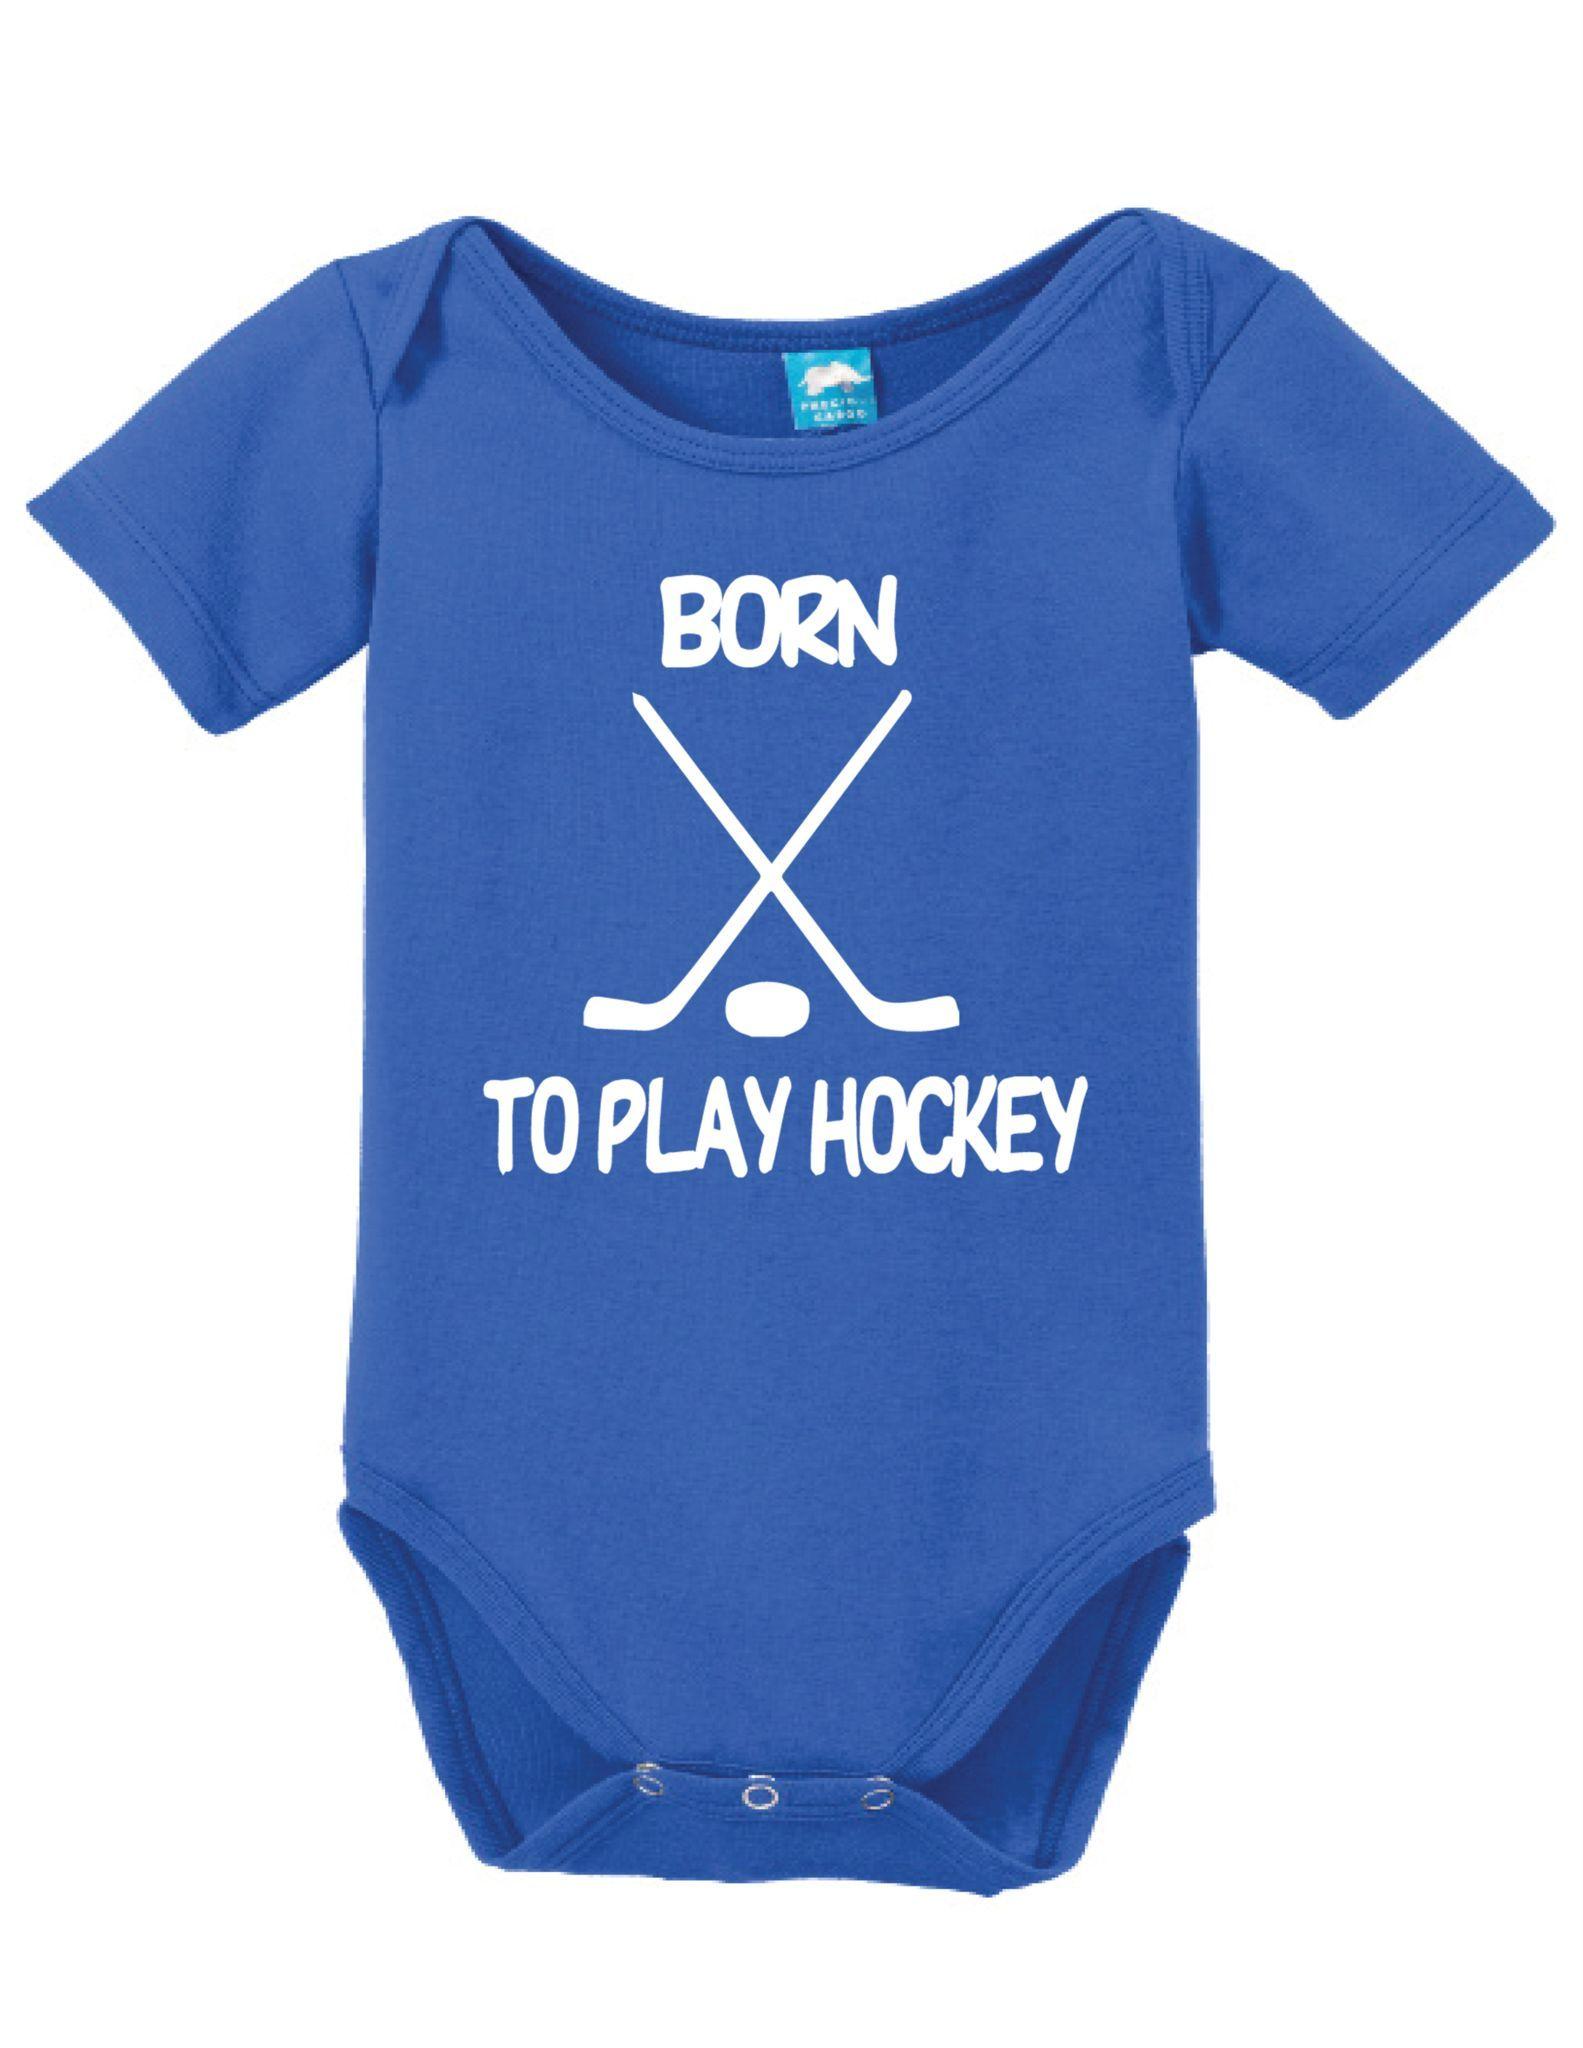 37ffa38b5 Born To Play Hockey   Hockey   Pinterest   Hockey, Baby bodysuit and ...